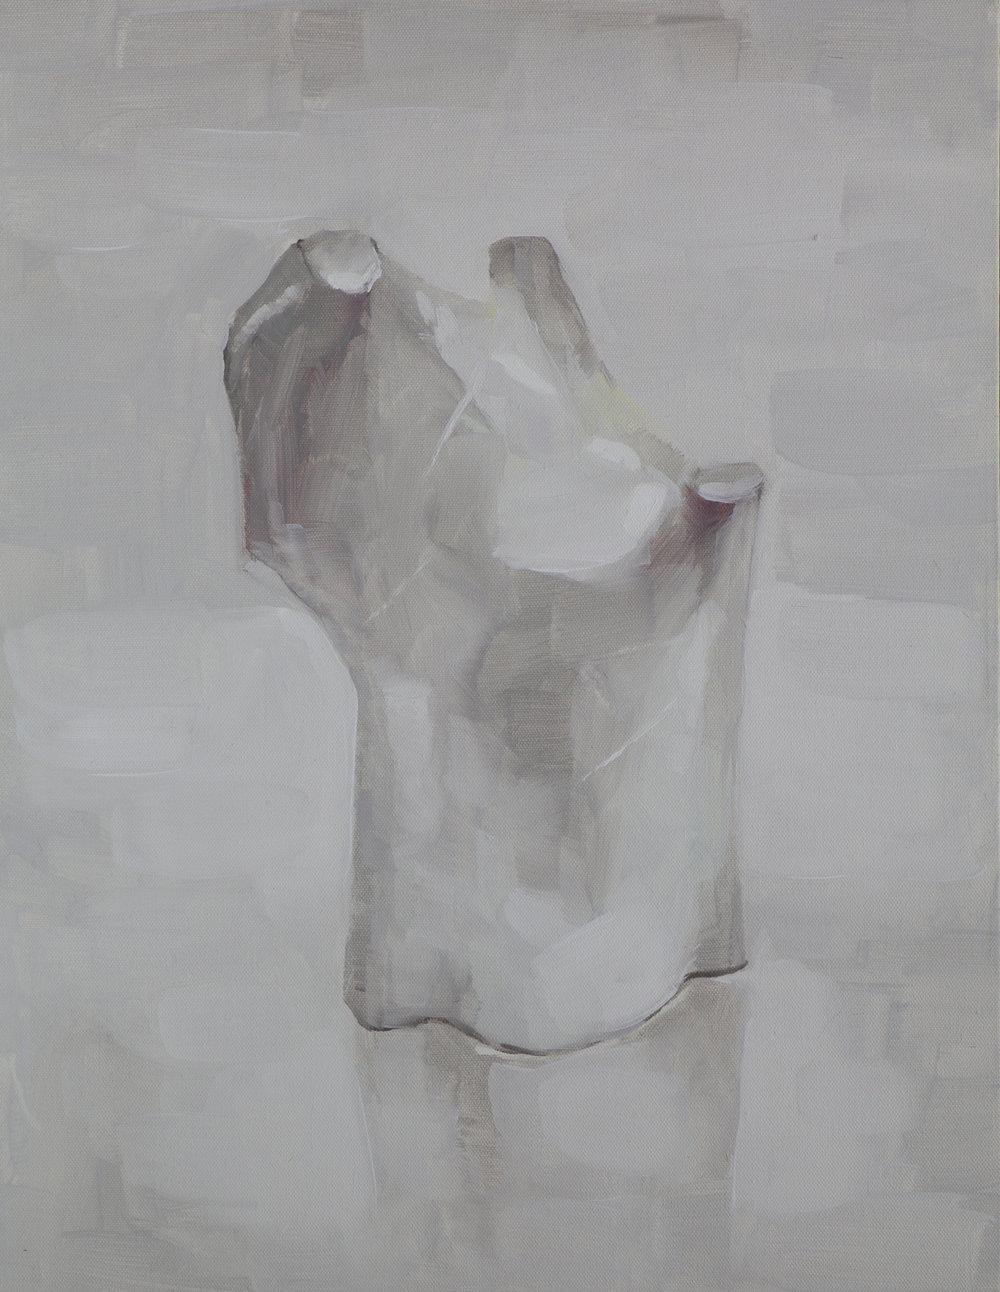 SH1809_Hong Soun_OrdinaryMonument M-1809_oil on canvas_52.5x41cm_2018.JPG